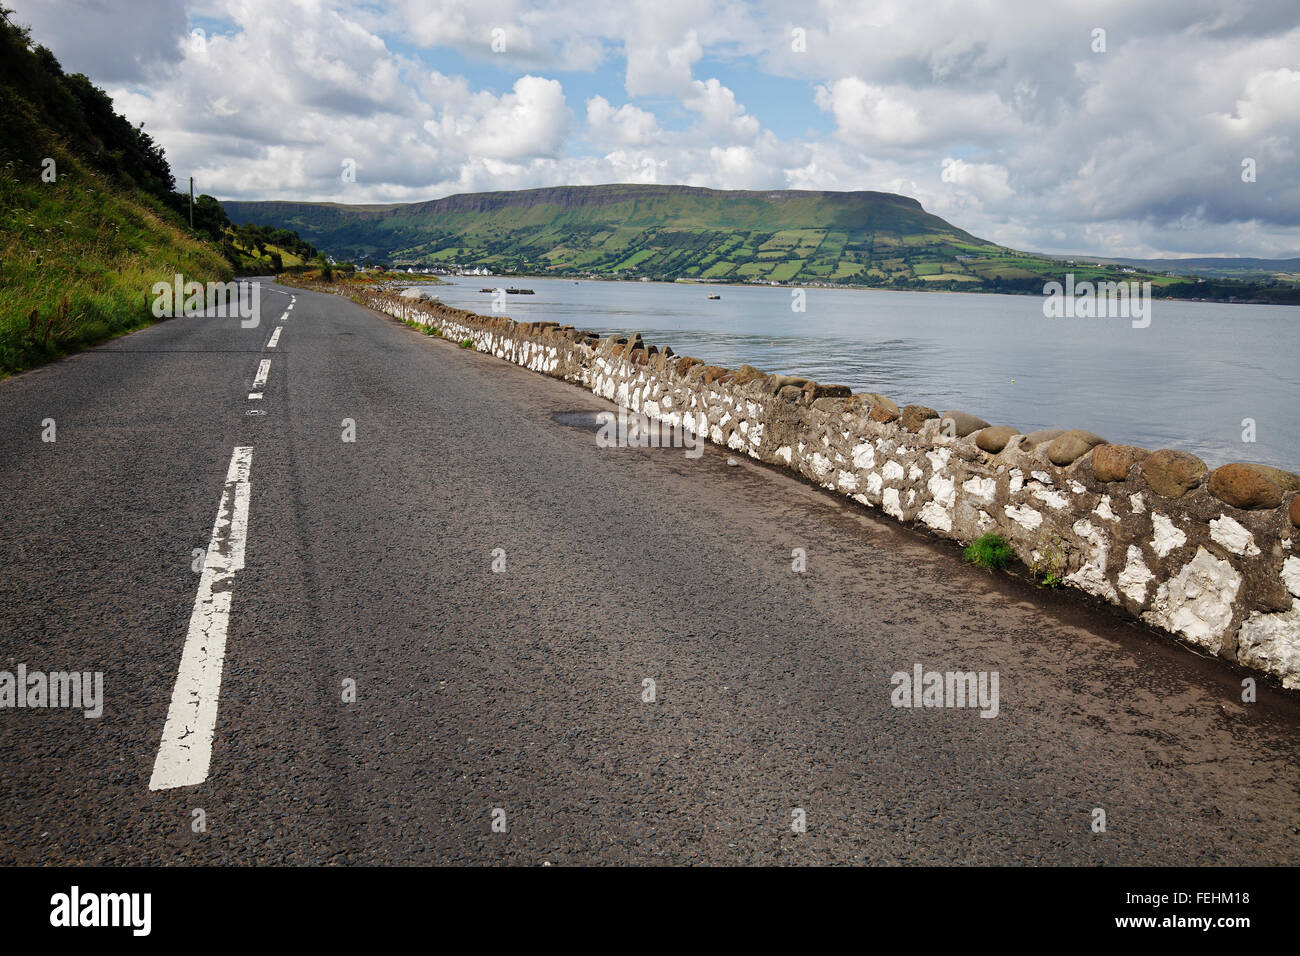 the Lurigethan Mountain near Glenariff and Waterfoot, County Antrim, Ireland - Stock Image